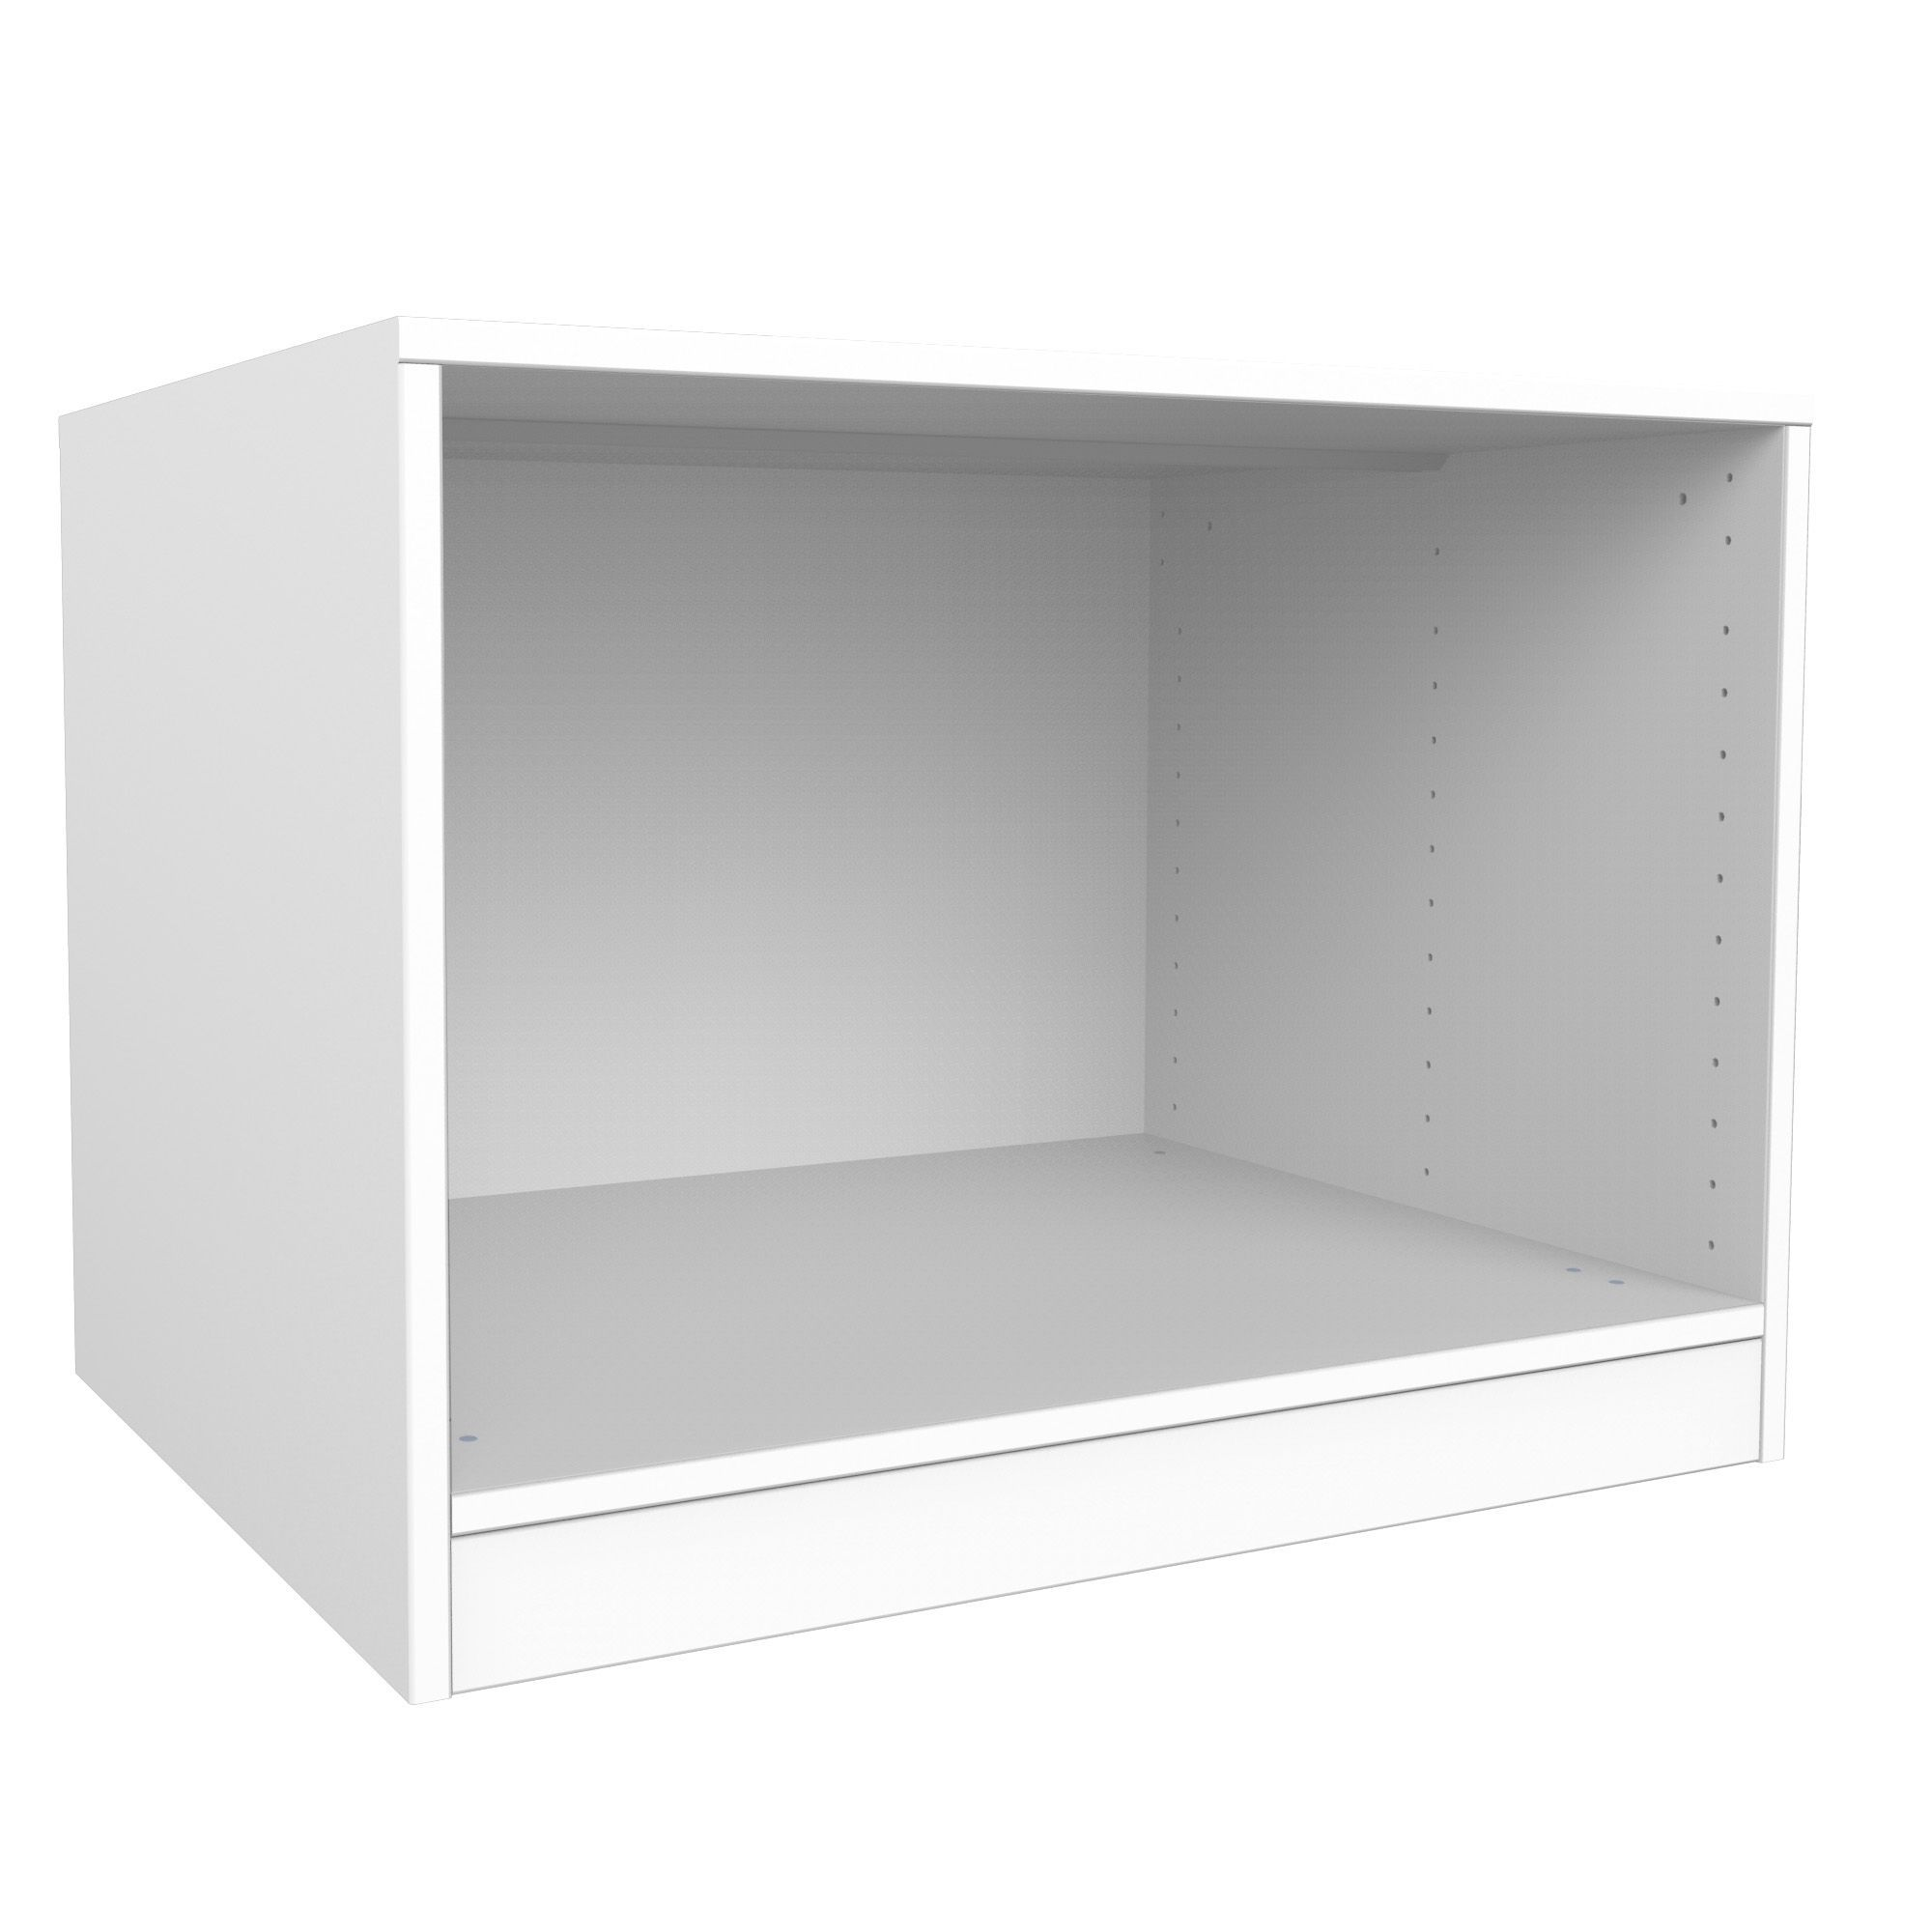 Darwin Modular White Bedside Cabinet (h)546mm (w)750mm (d)566mm